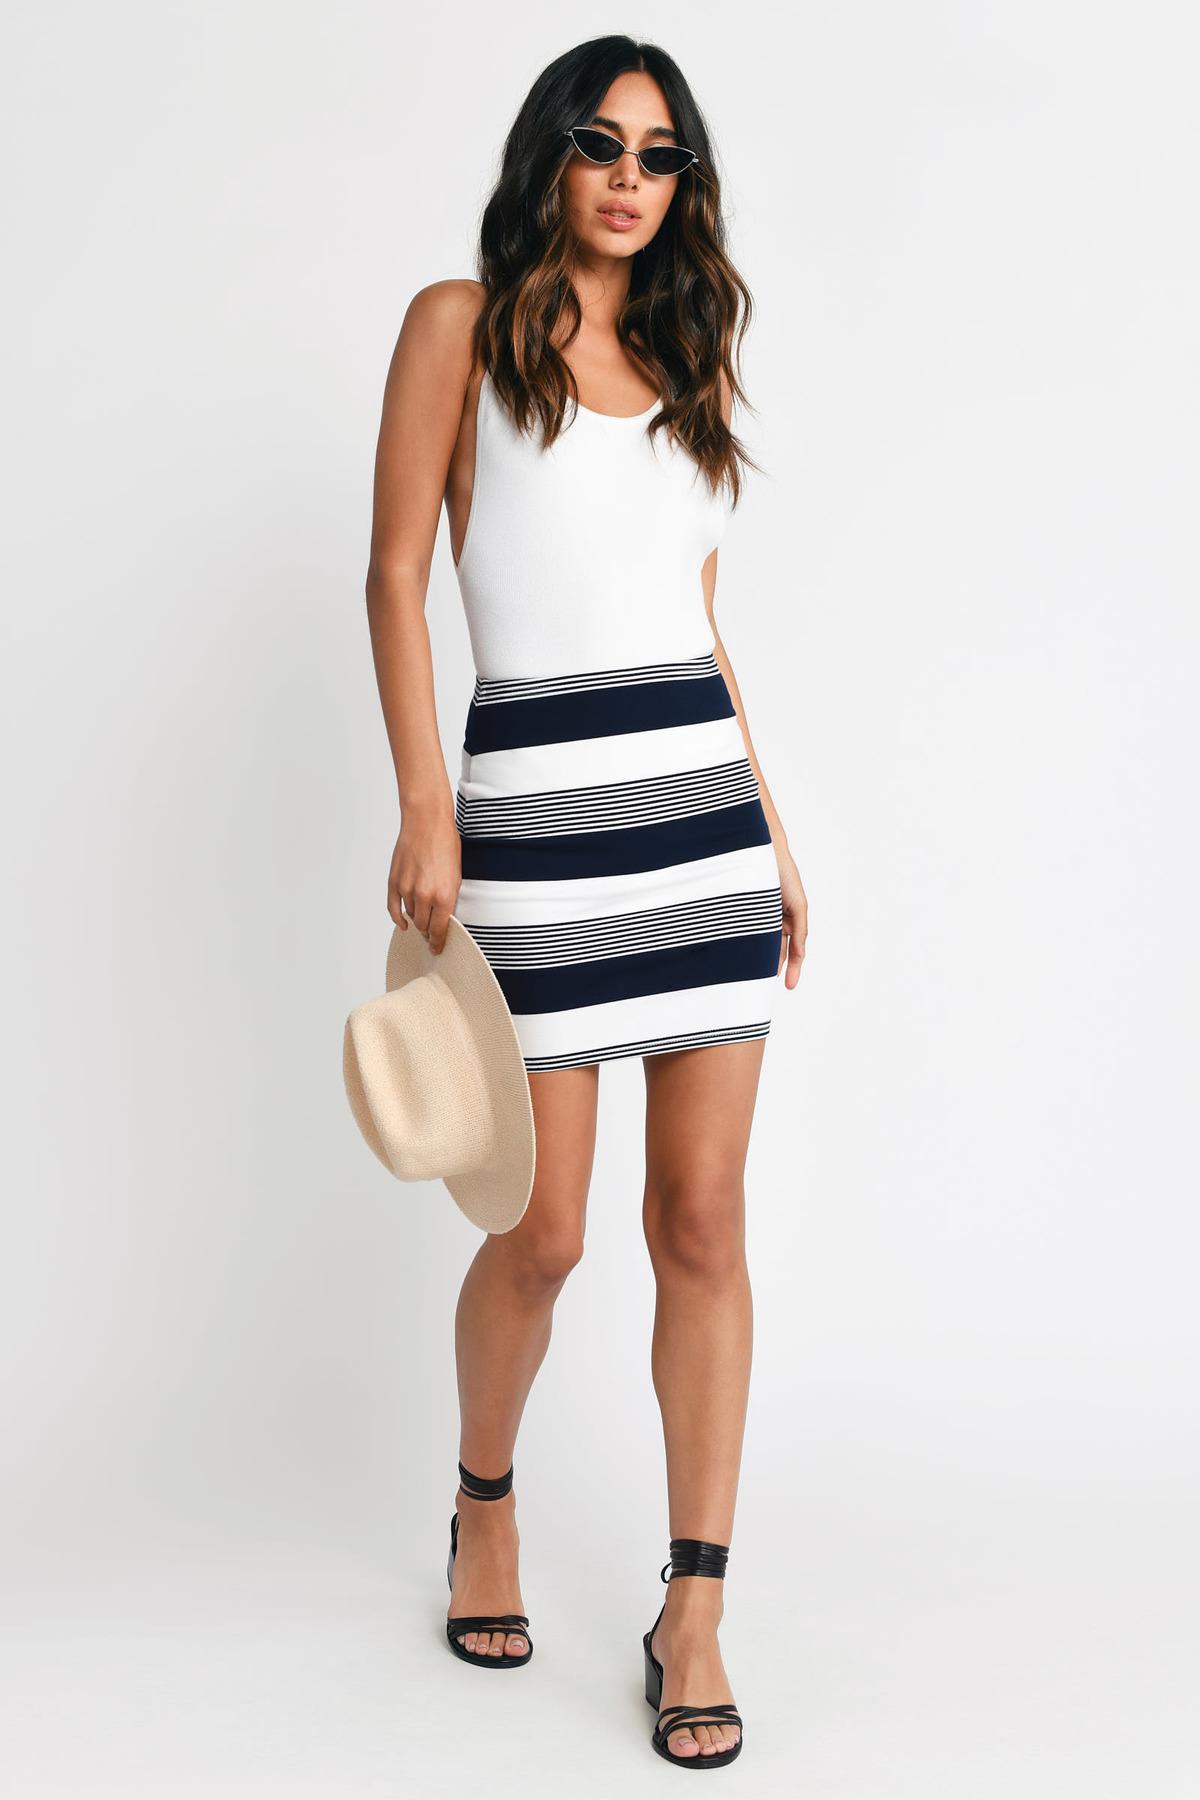 Cute Navy Skirt - High Waisted Skirt - Blue Skirt - $38.00